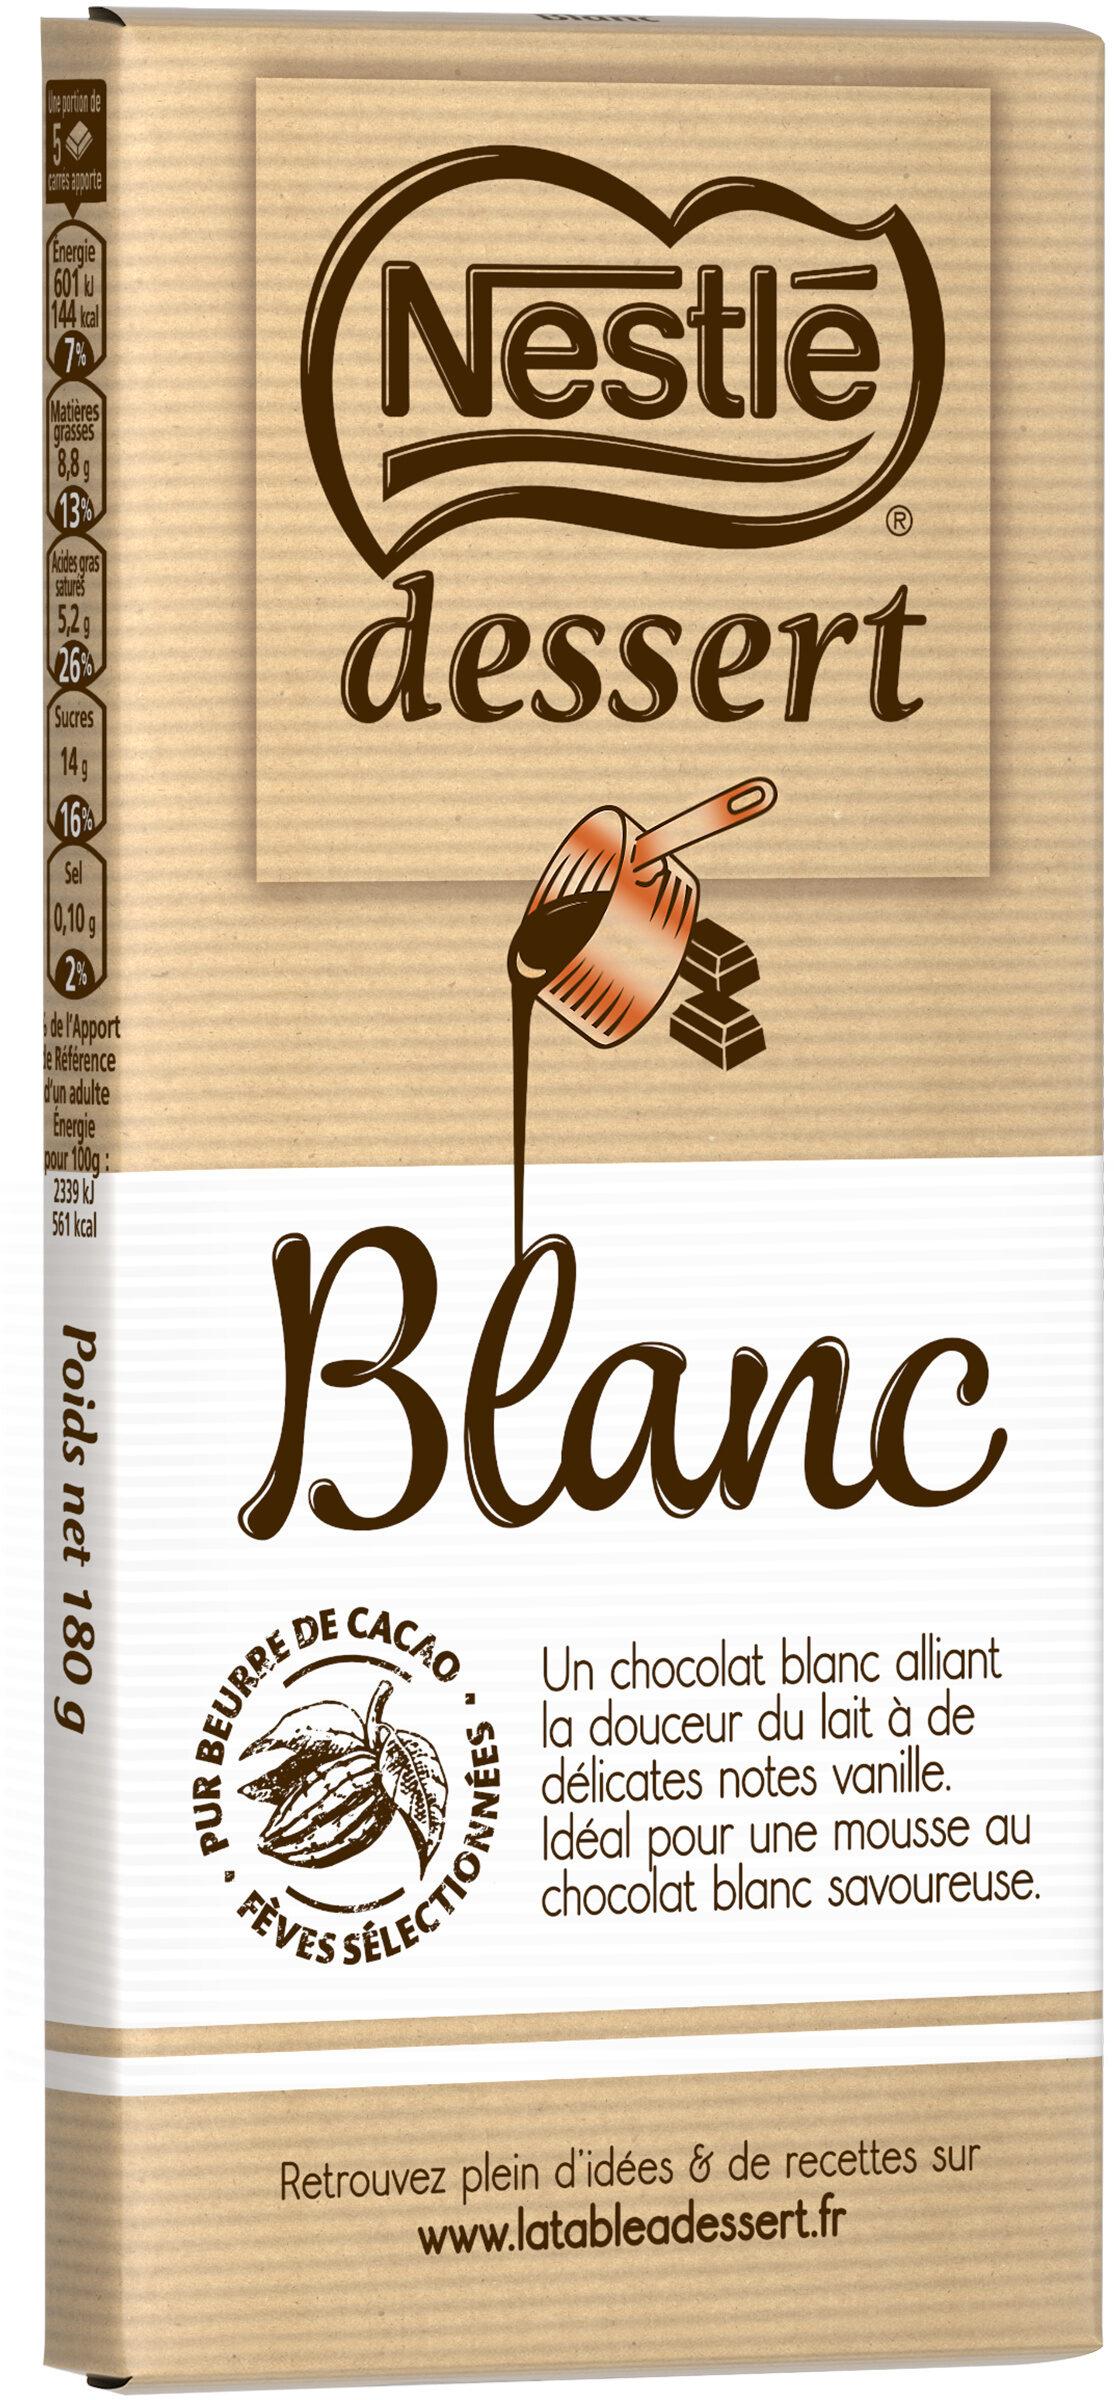 NESTLE DESSERT Chocolat Blanc - نتاج - fr